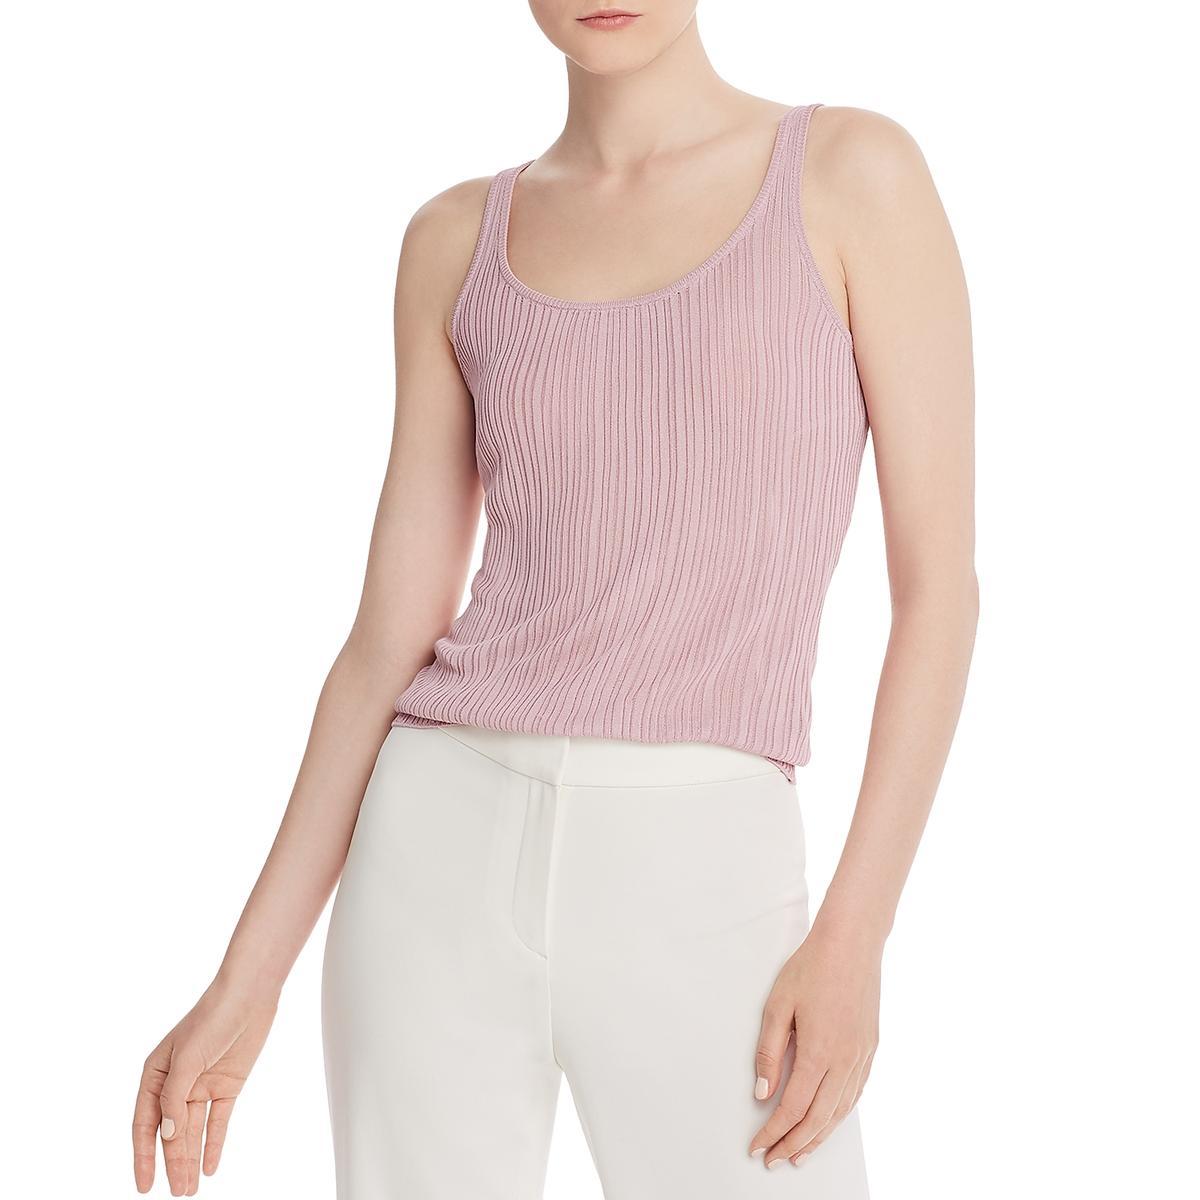 Theory Womens Linen Sleeveless Shell Top Shirt BHFO 6347